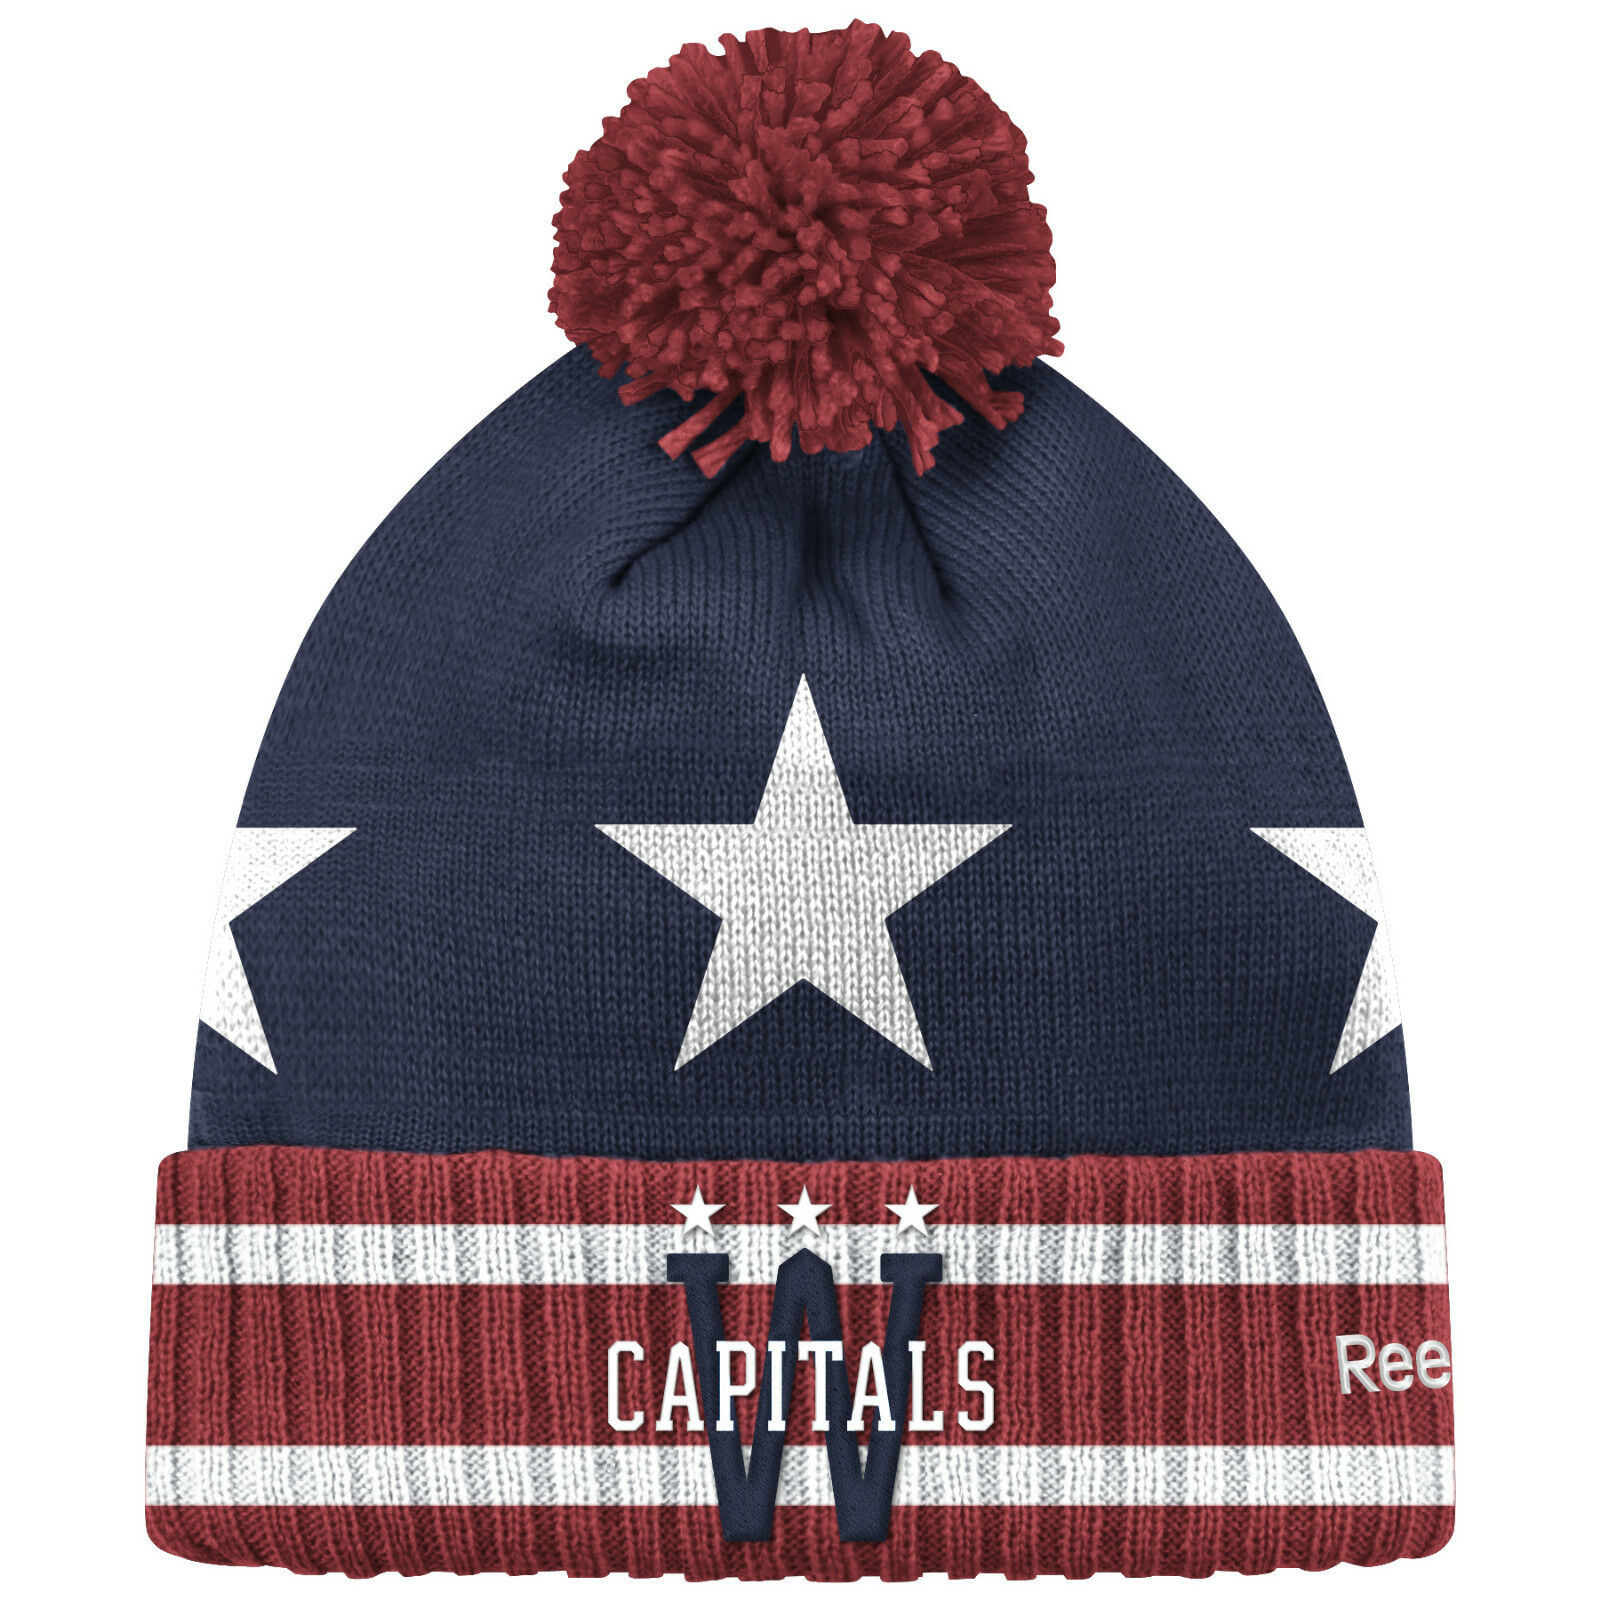 74e45947315 Washington Capitals 2015 NHL Winter Classic Reebok Cuffed Pom Knit ...